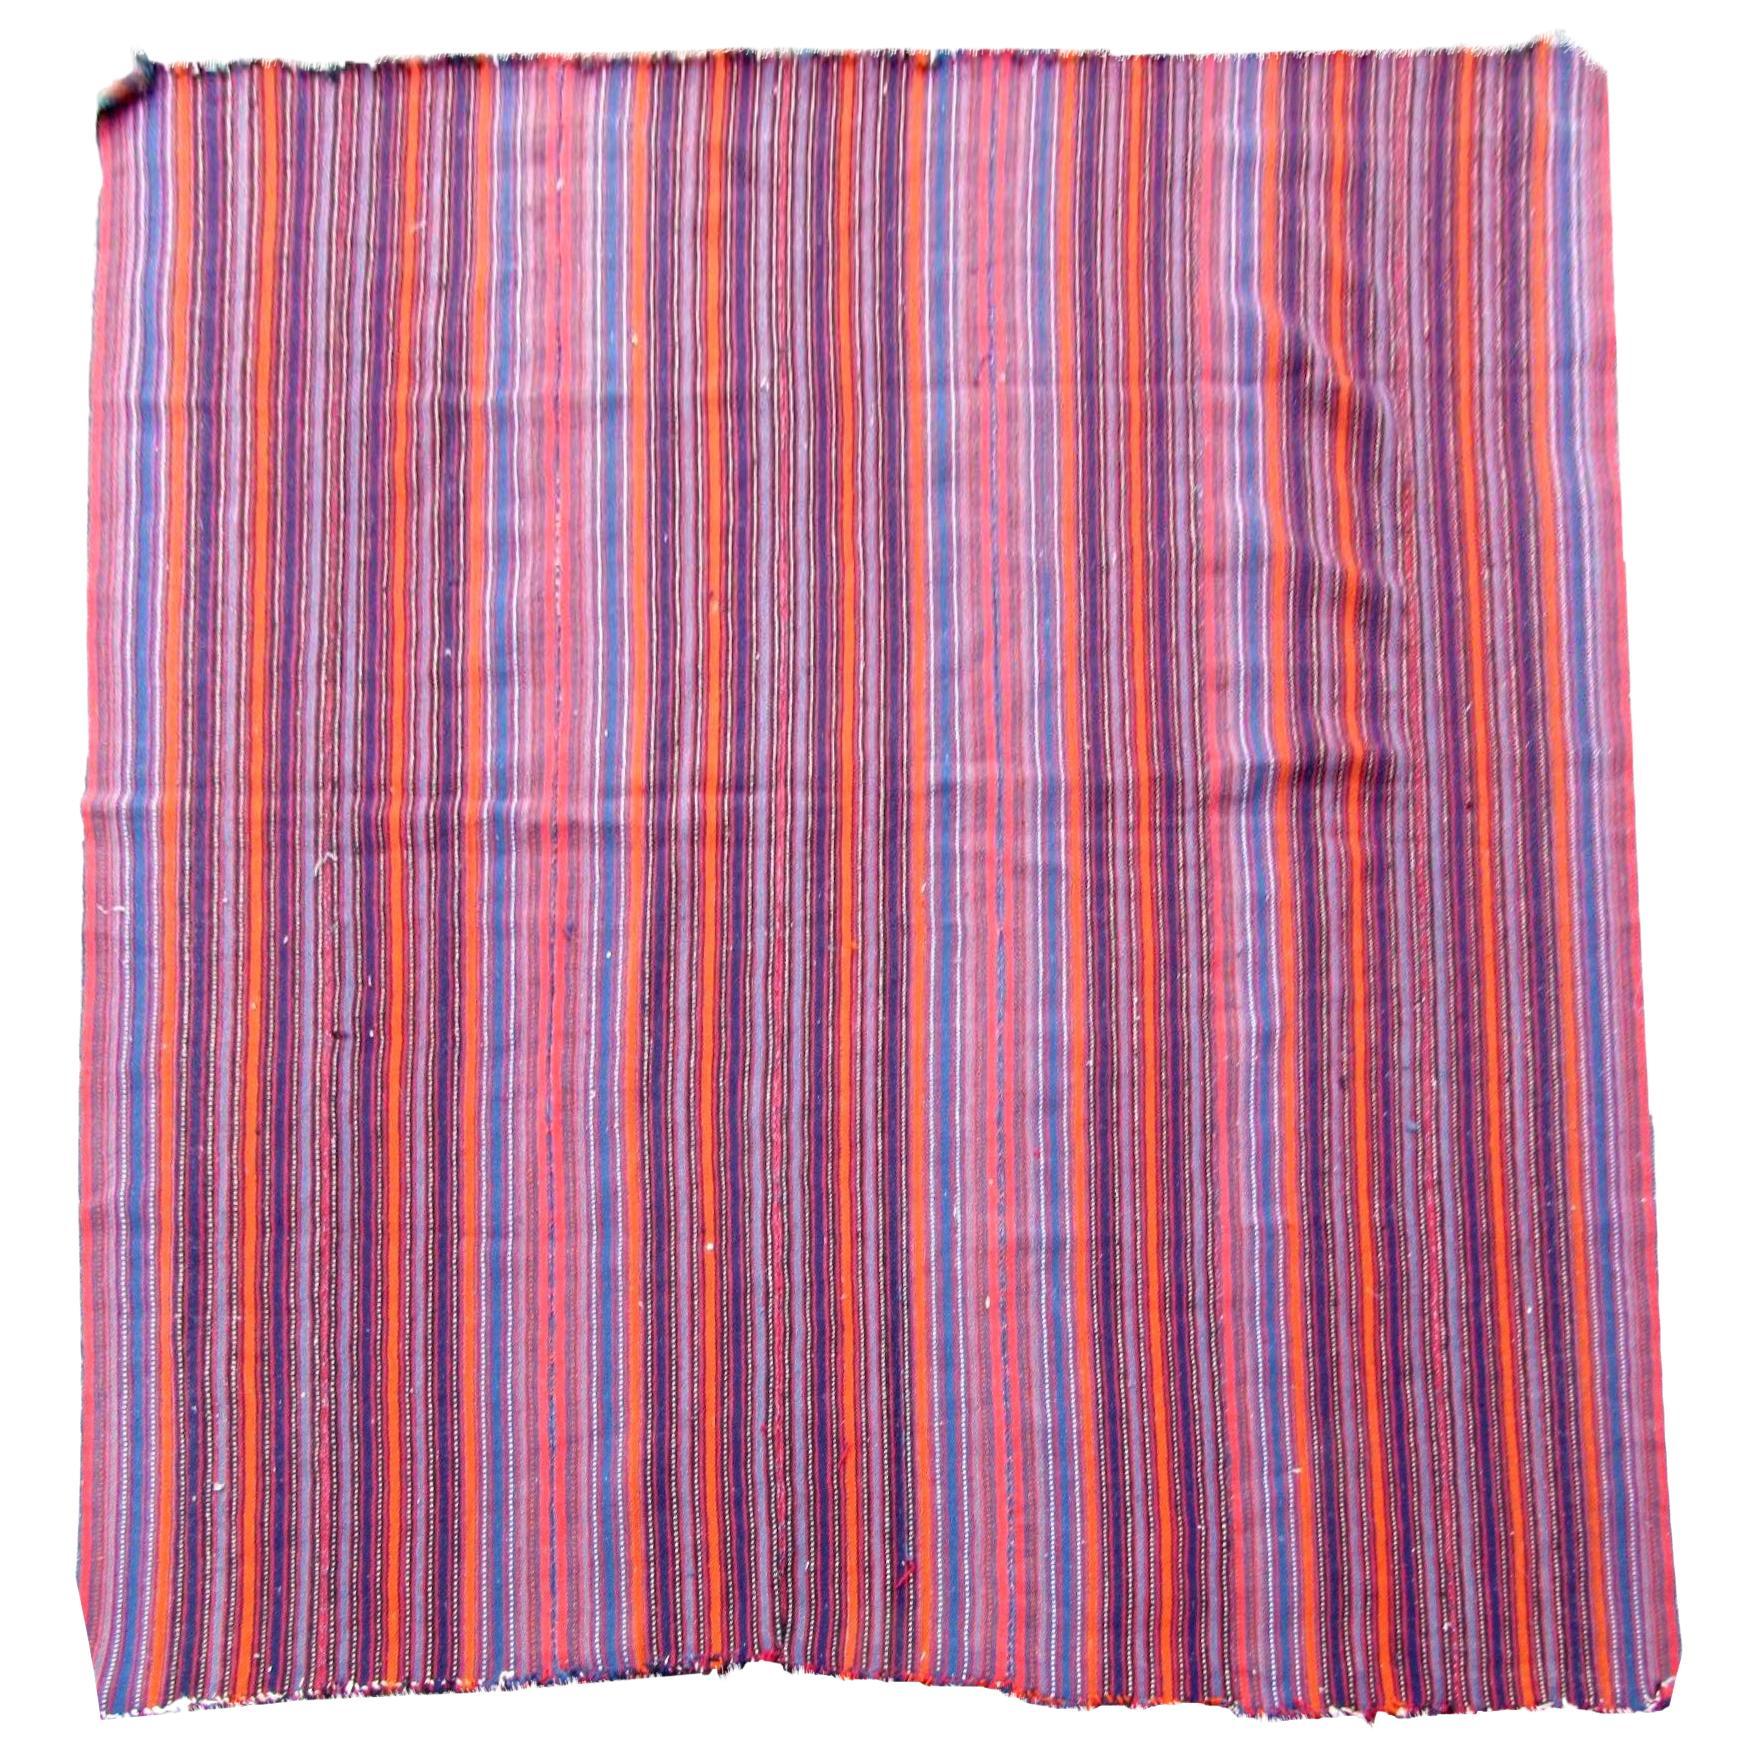 Handmade Antique Jajim Style Kilim, 1930s, 1Q0240